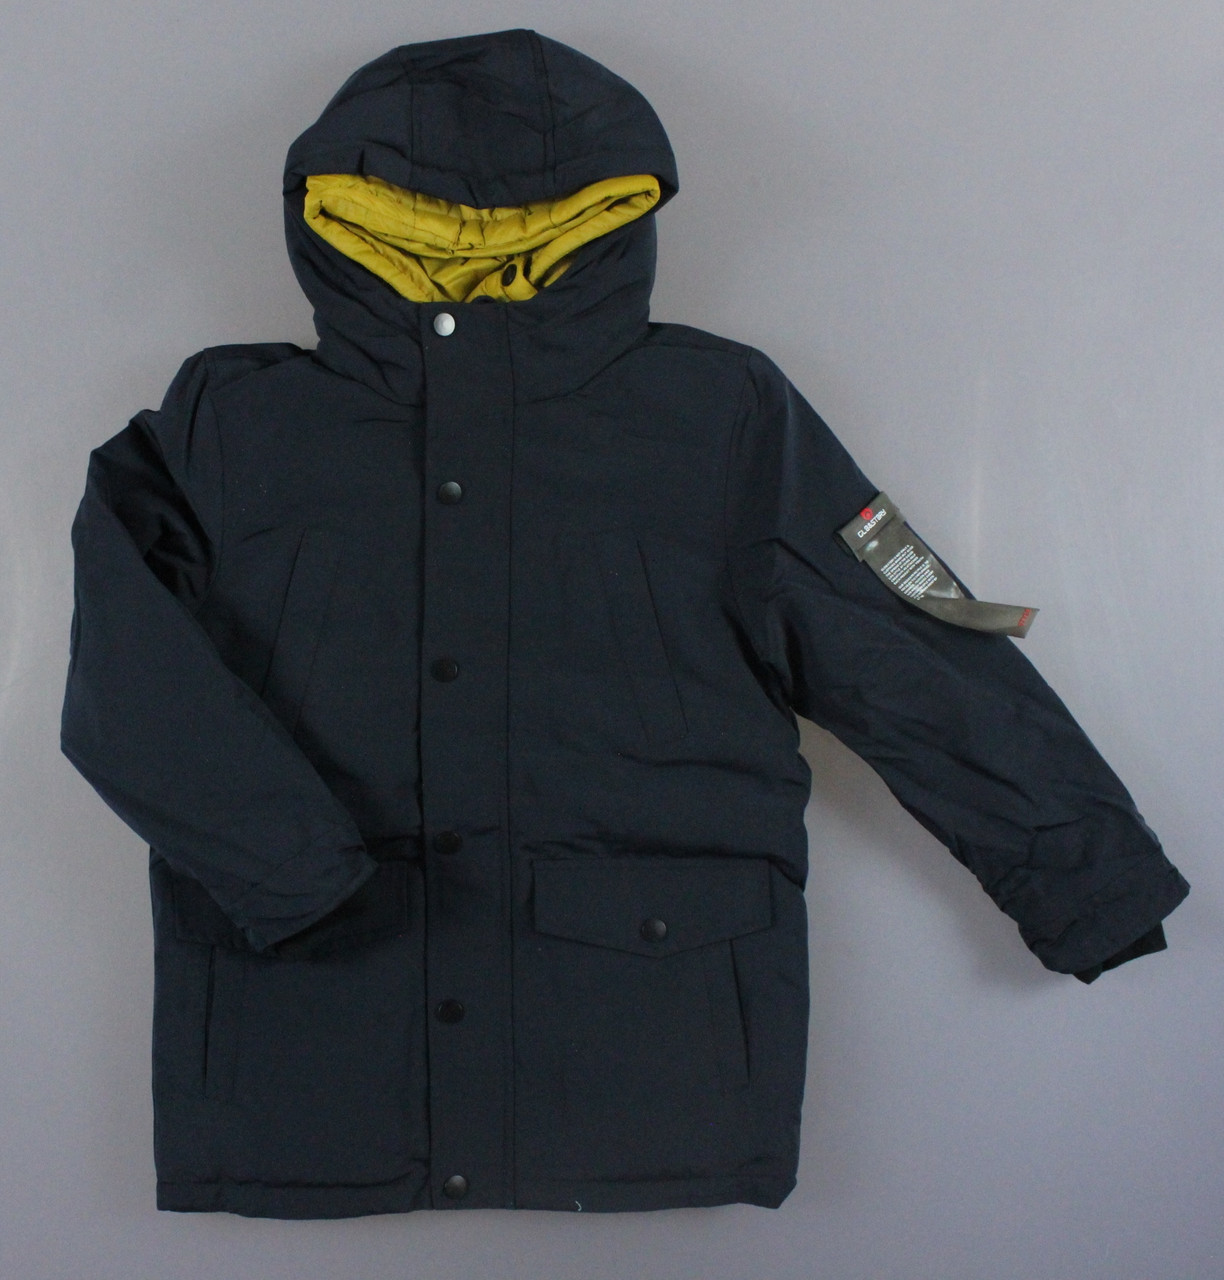 {есть:158/164} Куртка утепленная для мальчиков Glo-Story,  Артикул: BMA1350-т.синий [158/164]